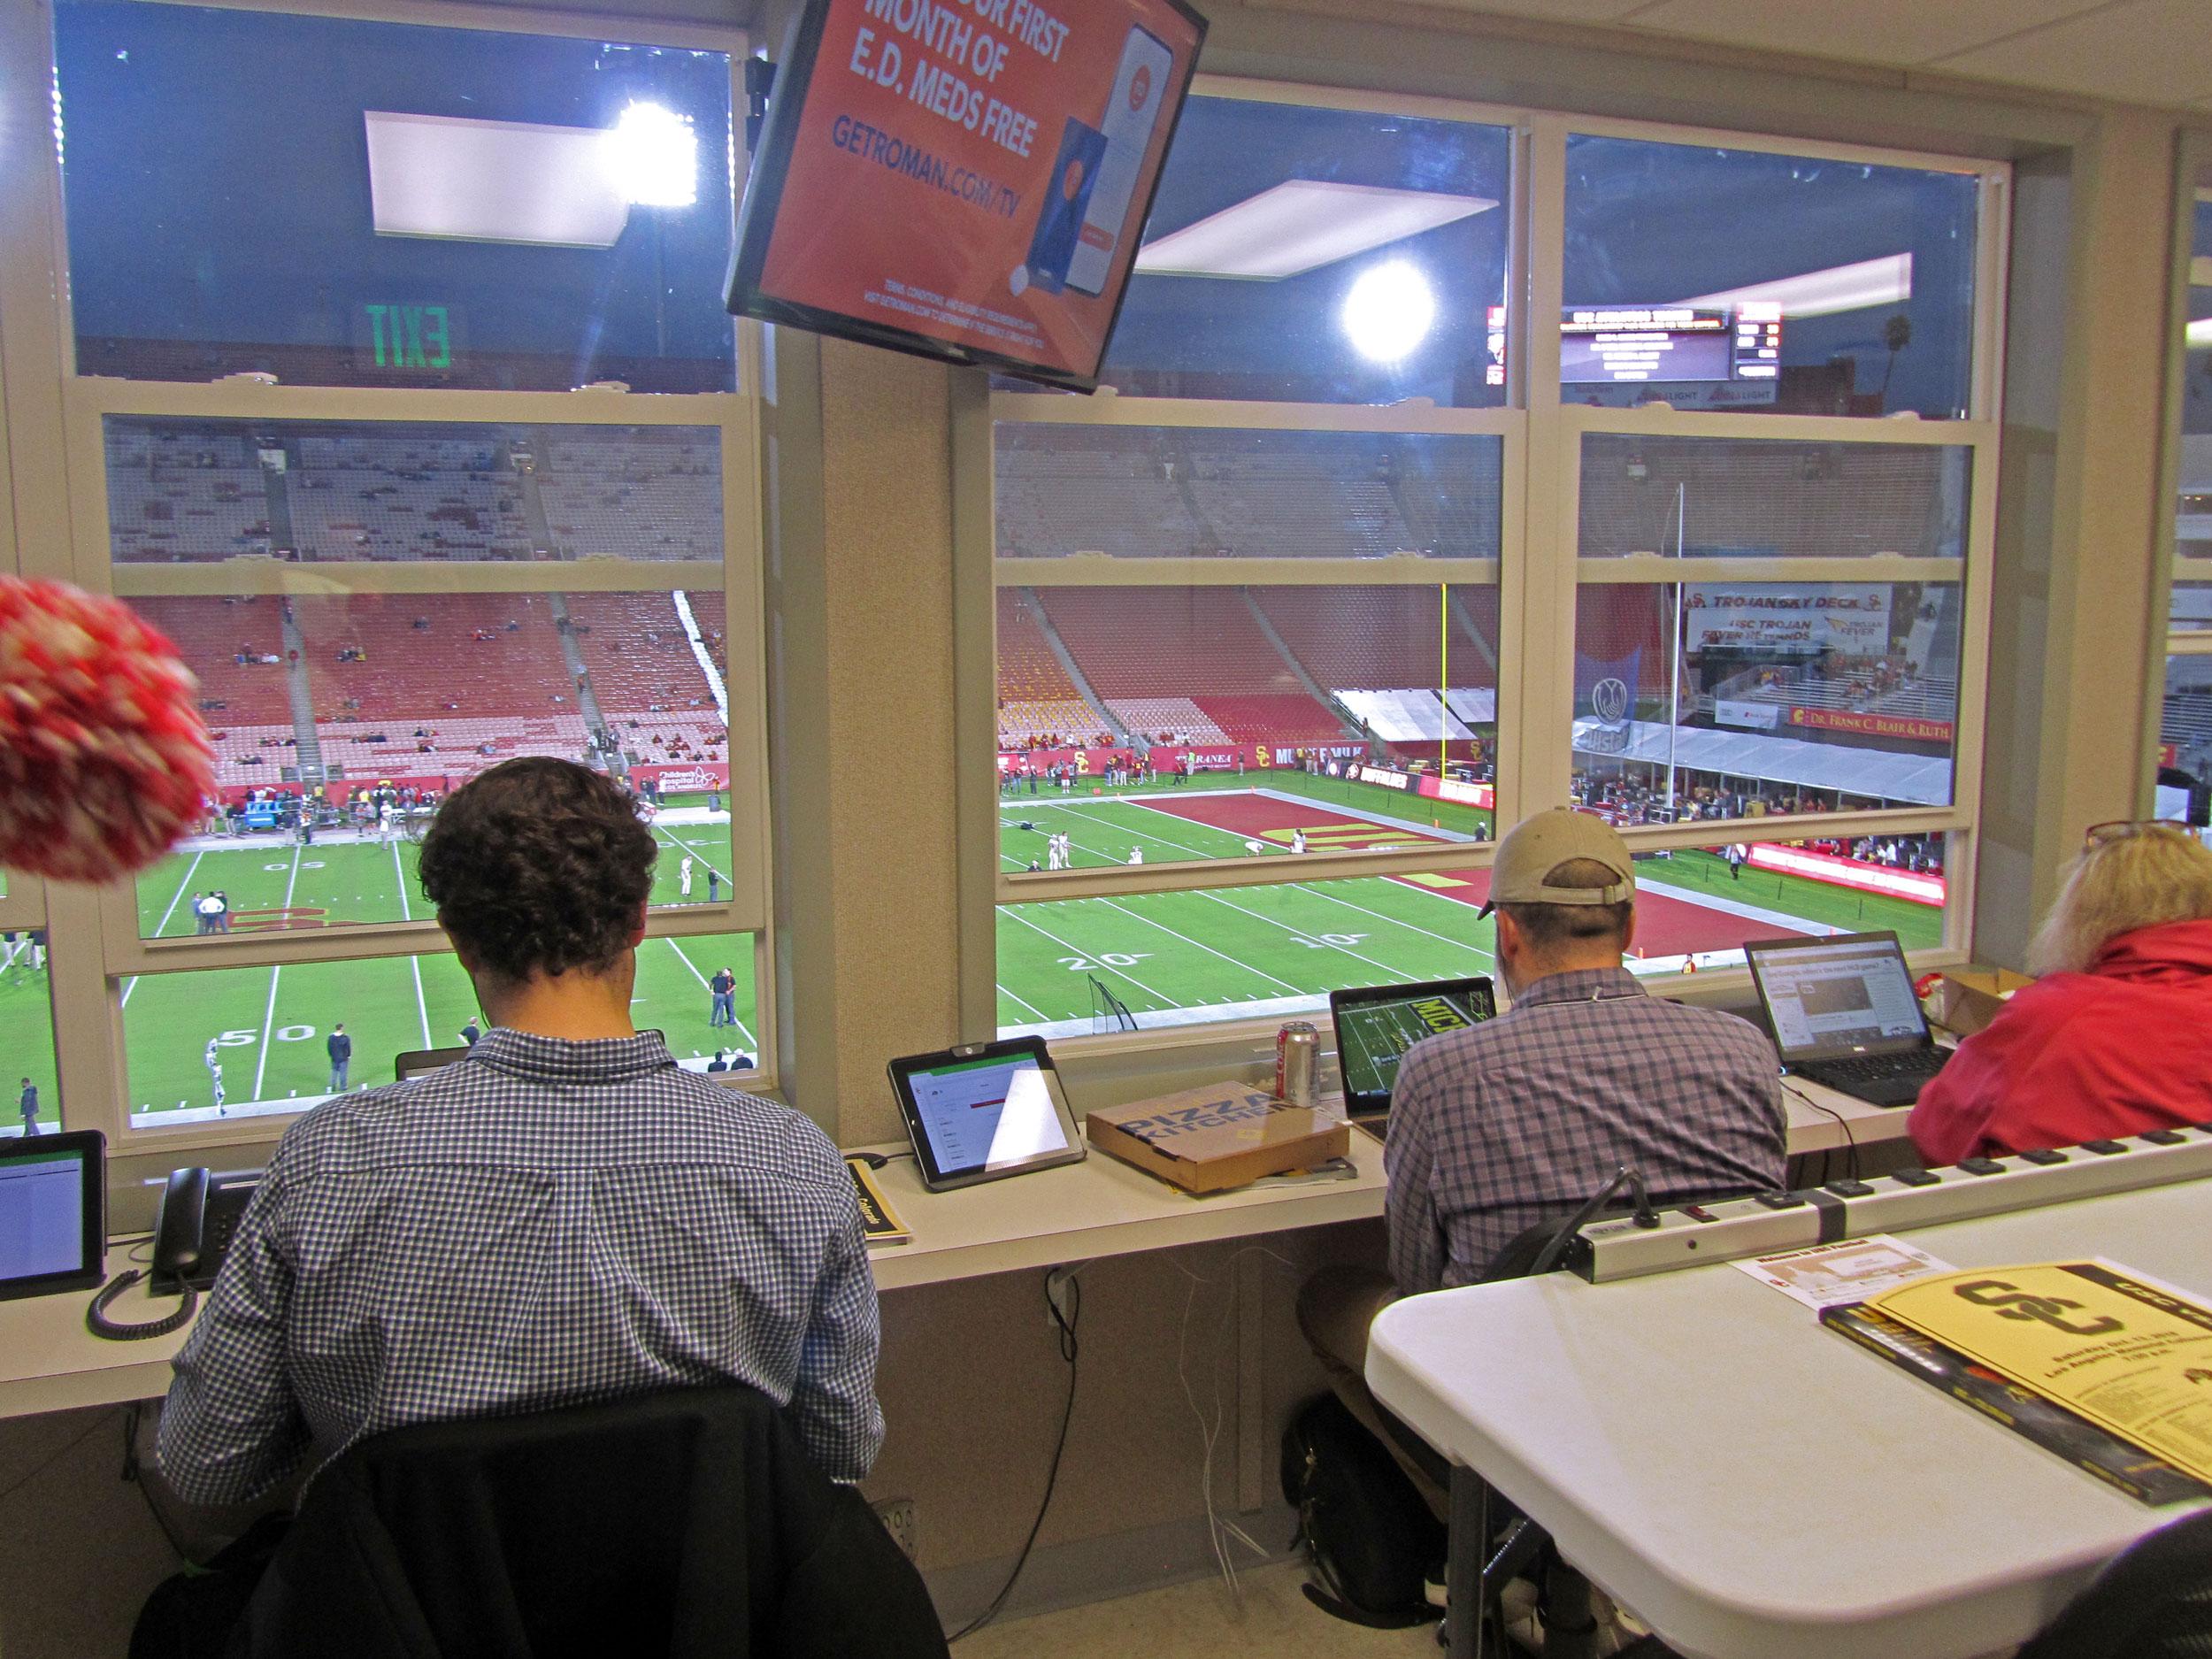 Media/Press Room, View 5